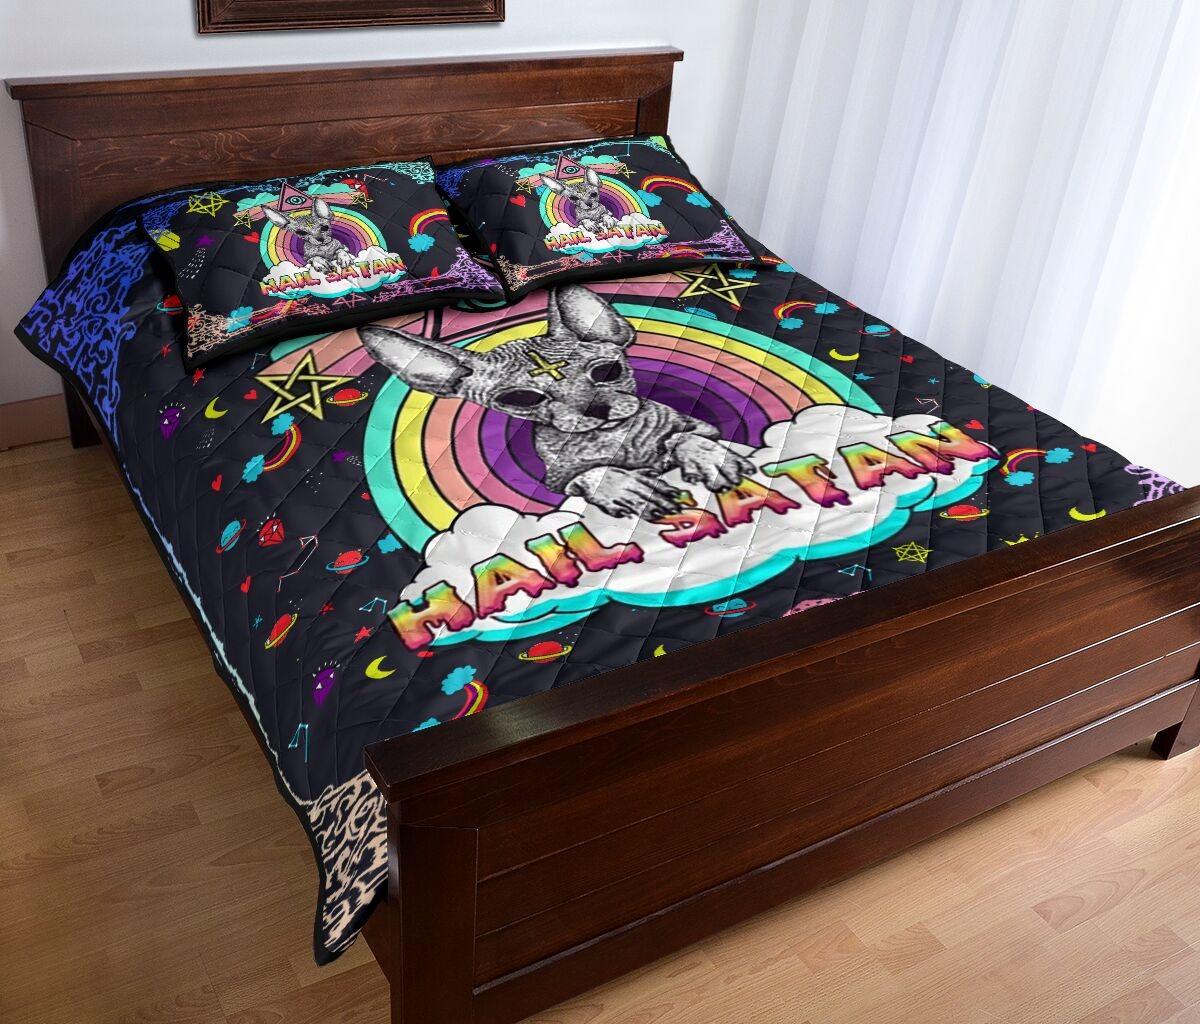 Sphyn hail satan quilt bedding set 11